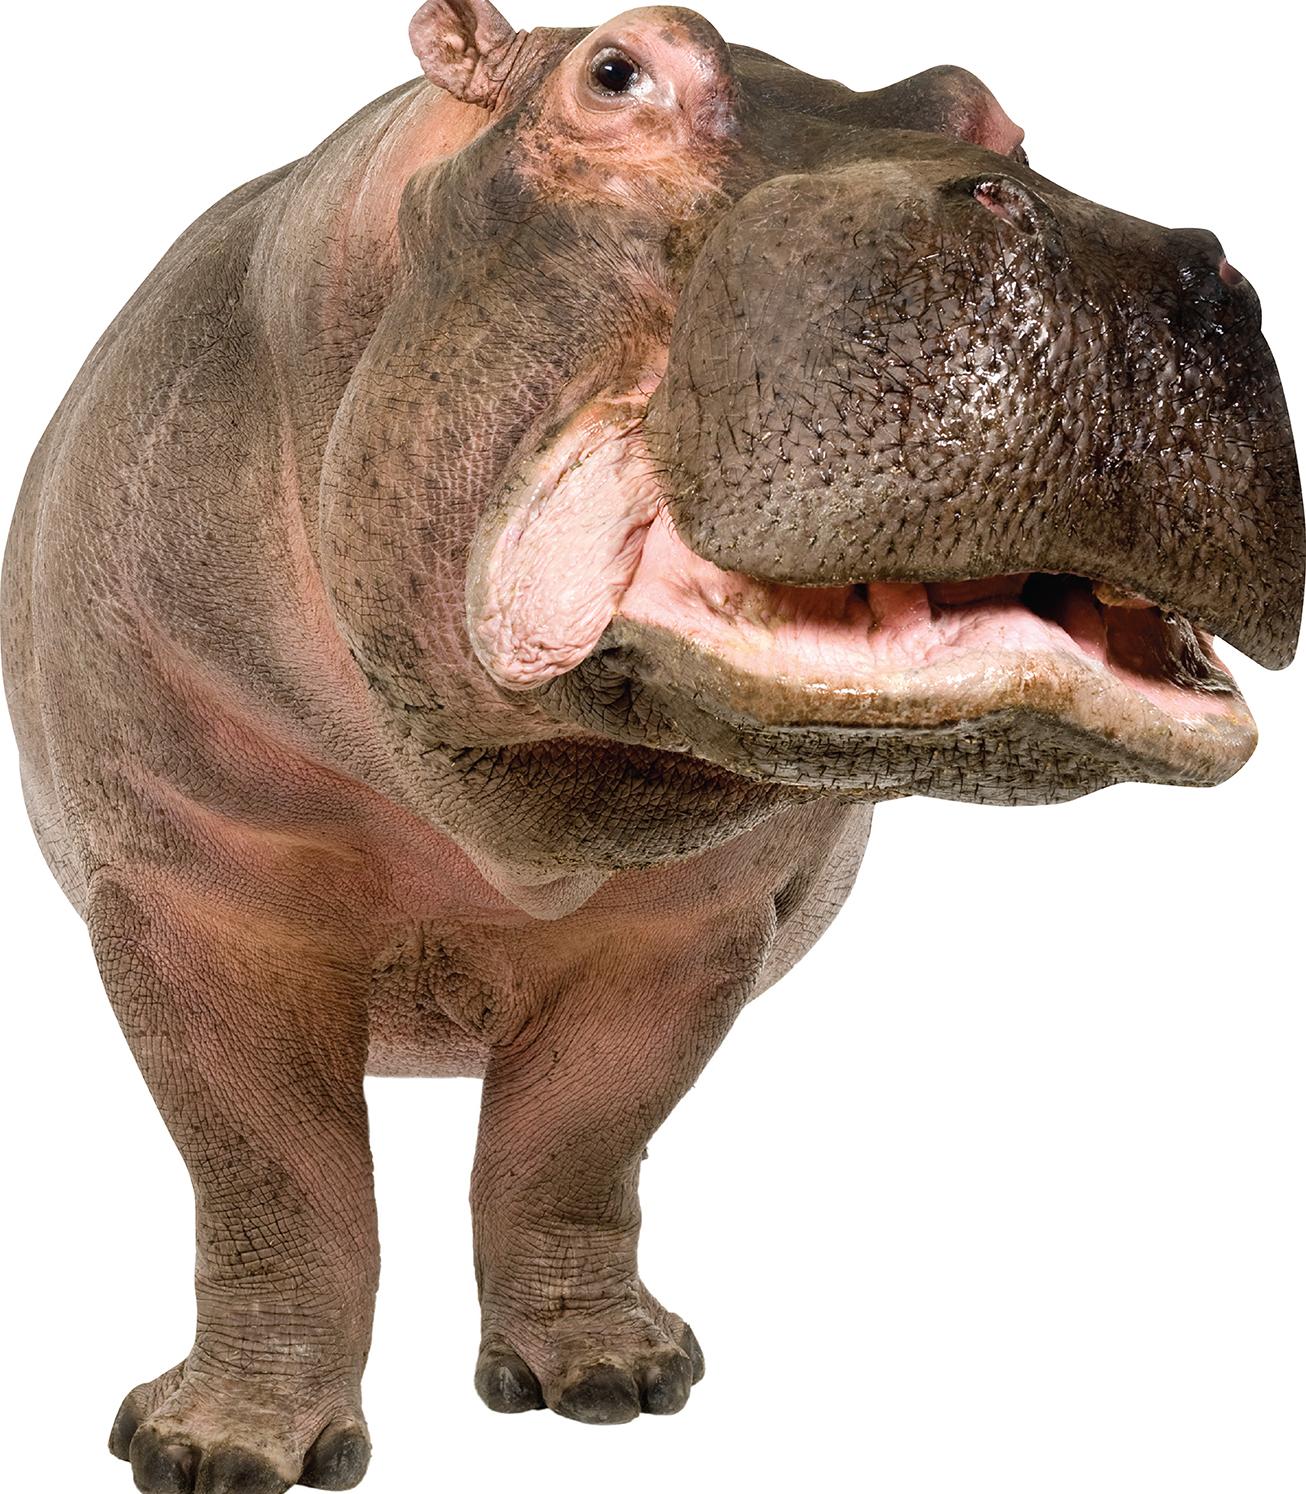 Hippo PNG - PNG Hippopotamus